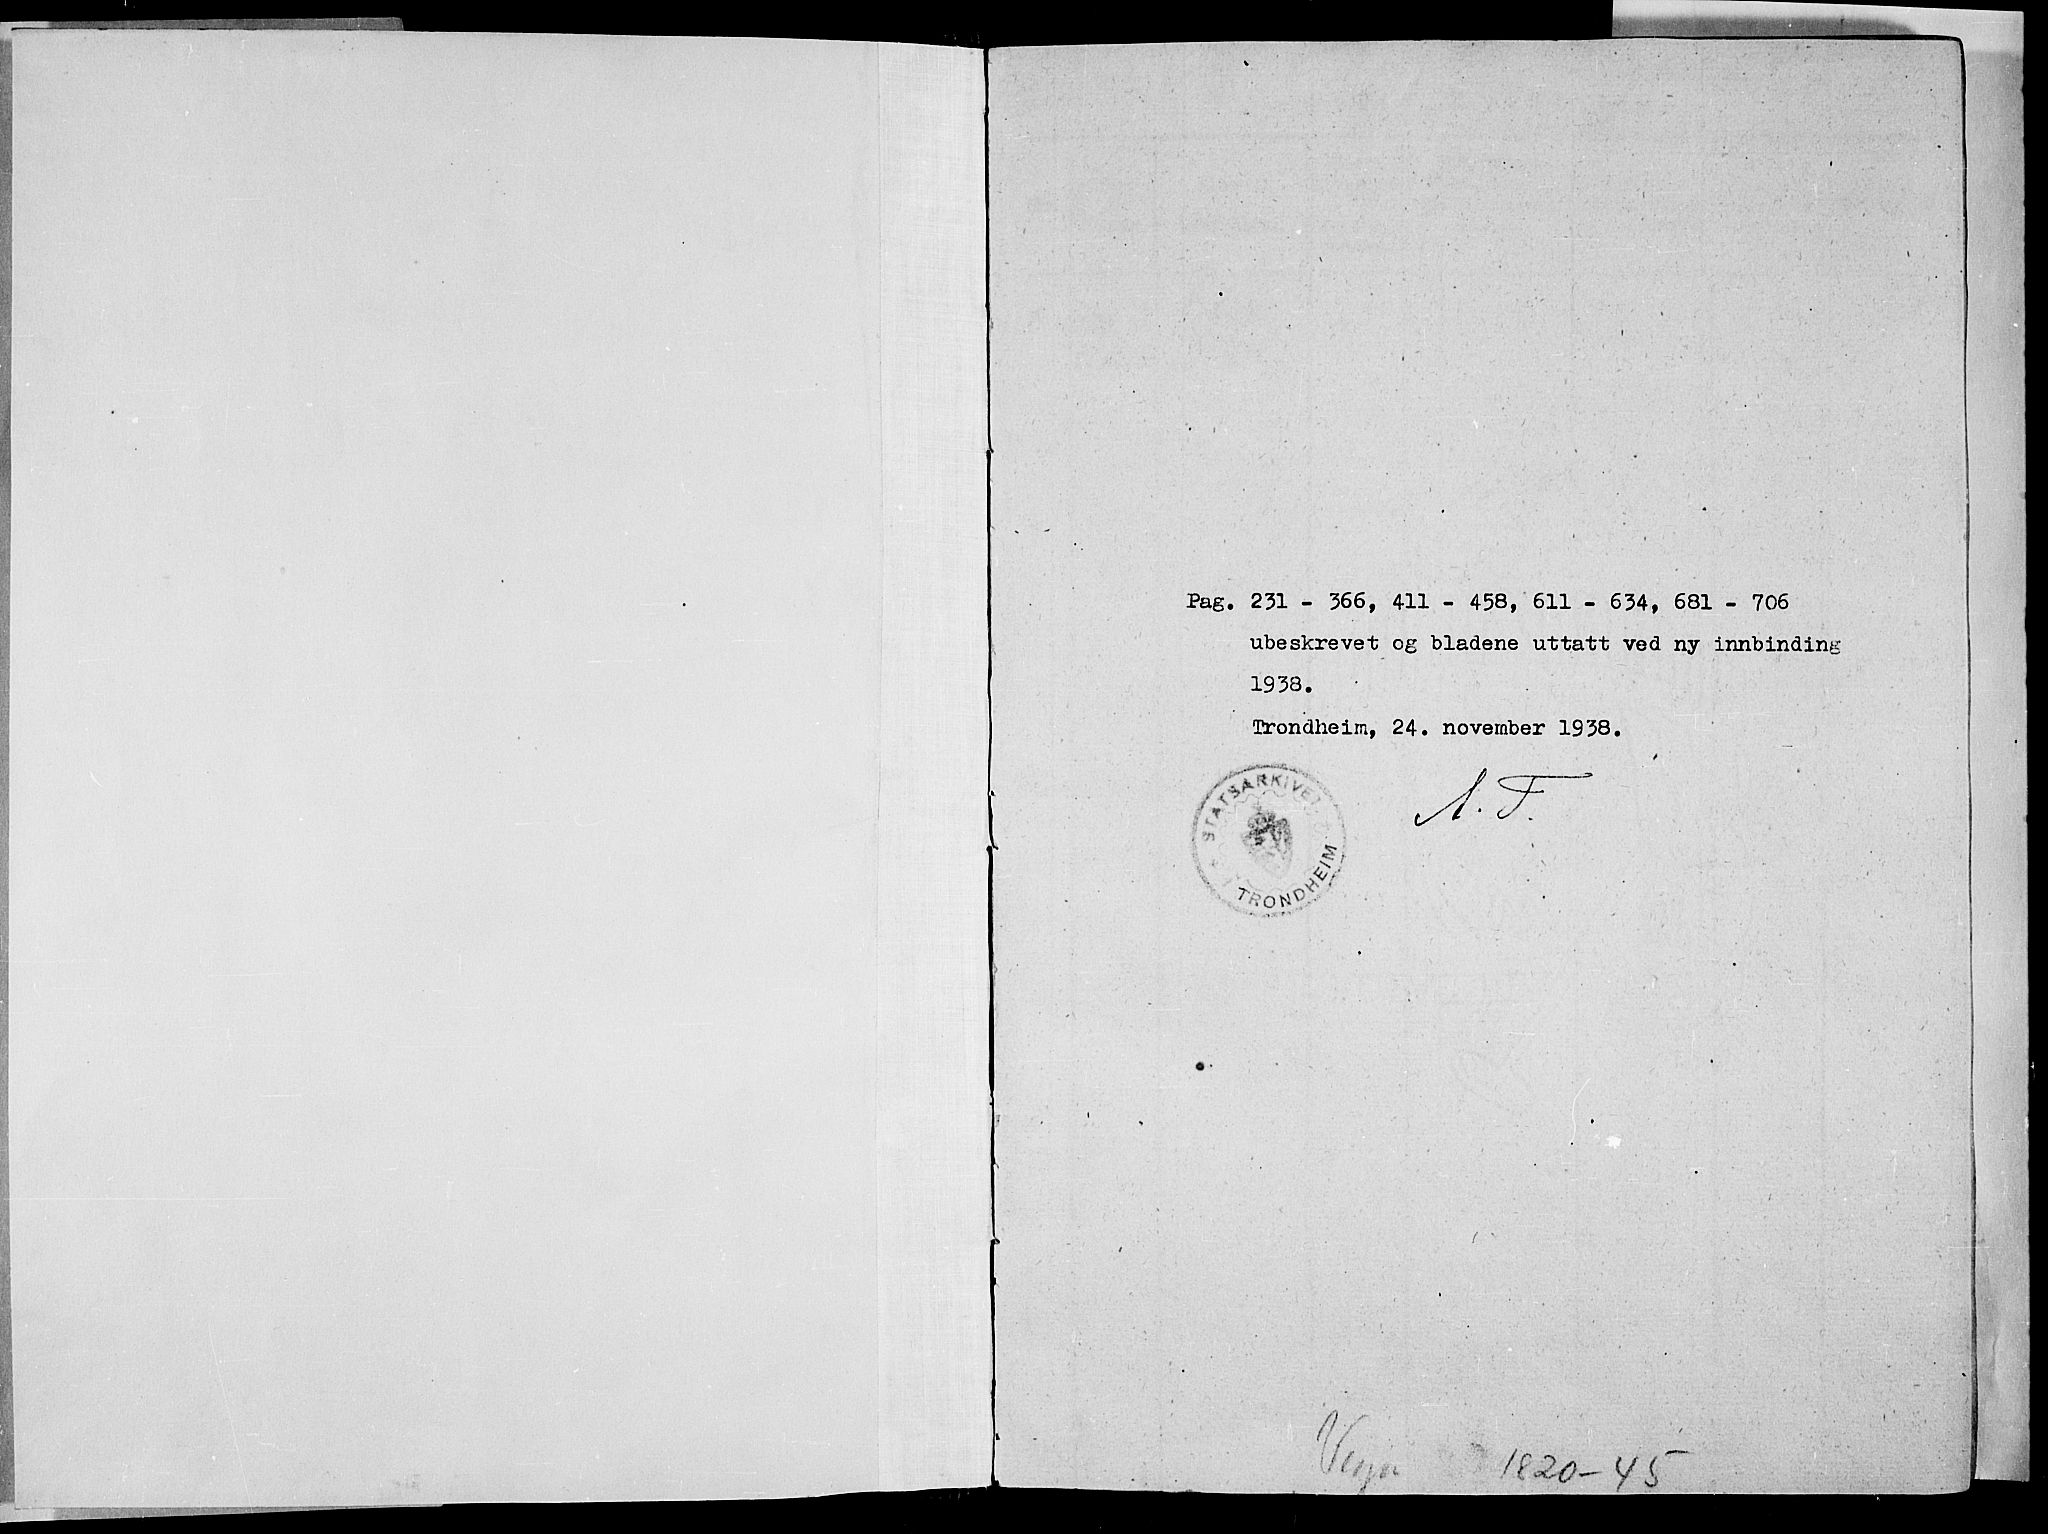 SAT, Ministerialprotokoller, klokkerbøker og fødselsregistre - Nordland, 816/L0239: Ministerialbok nr. 816A05, 1820-1845